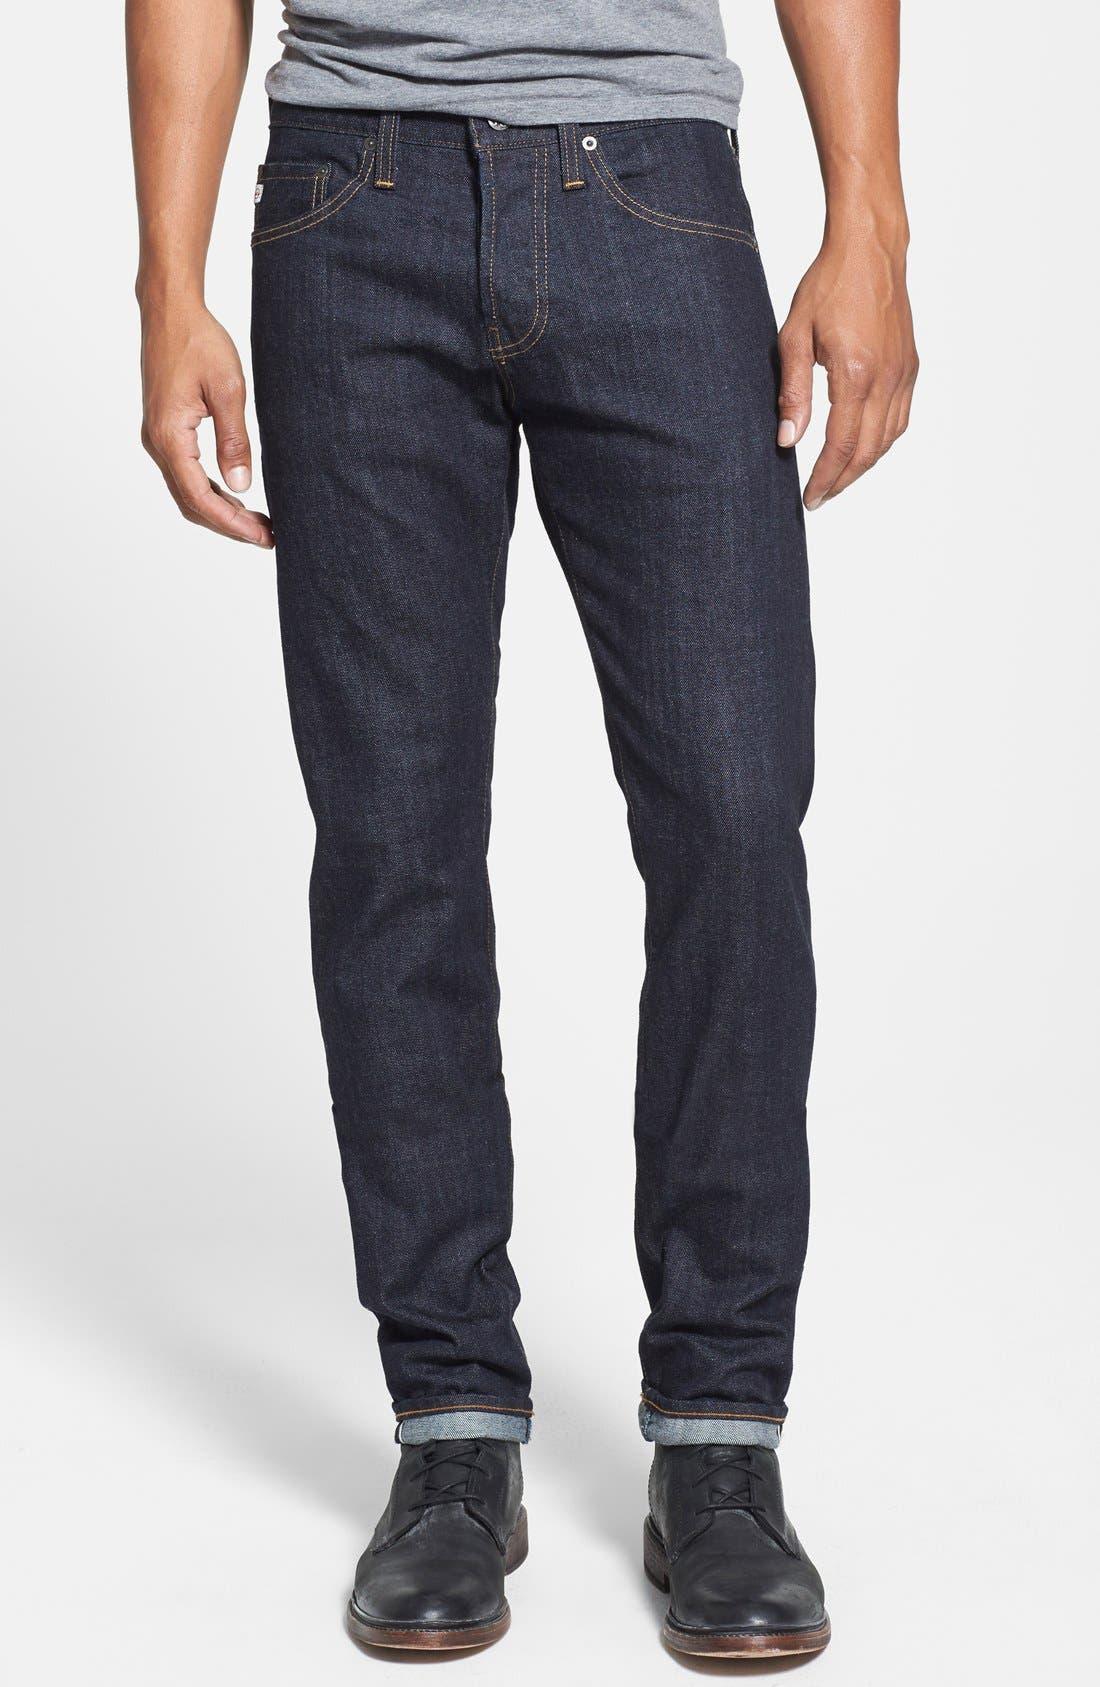 Alternate Image 1 Selected - AG 'Dylan' Skinny Fit Selvedge Jeans (Alpha)